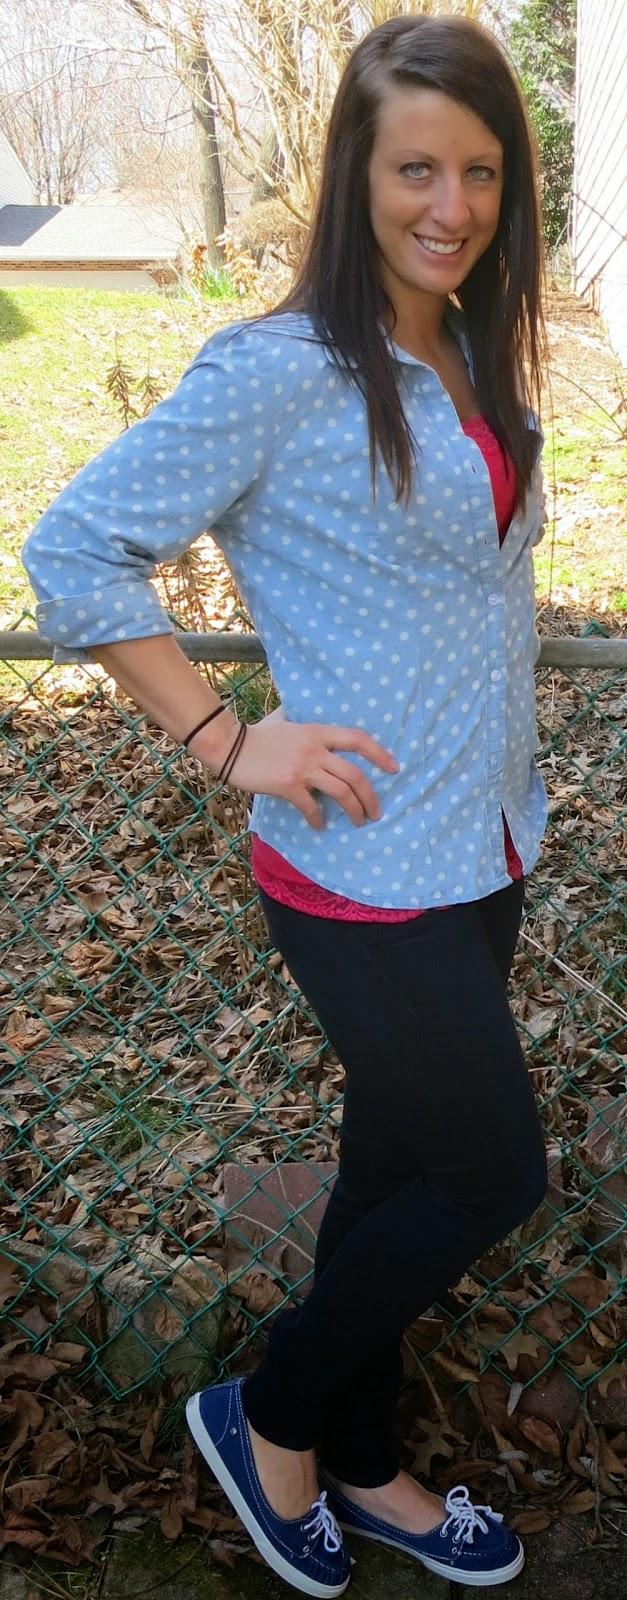 polka dot blouse, fashion, outfit, target